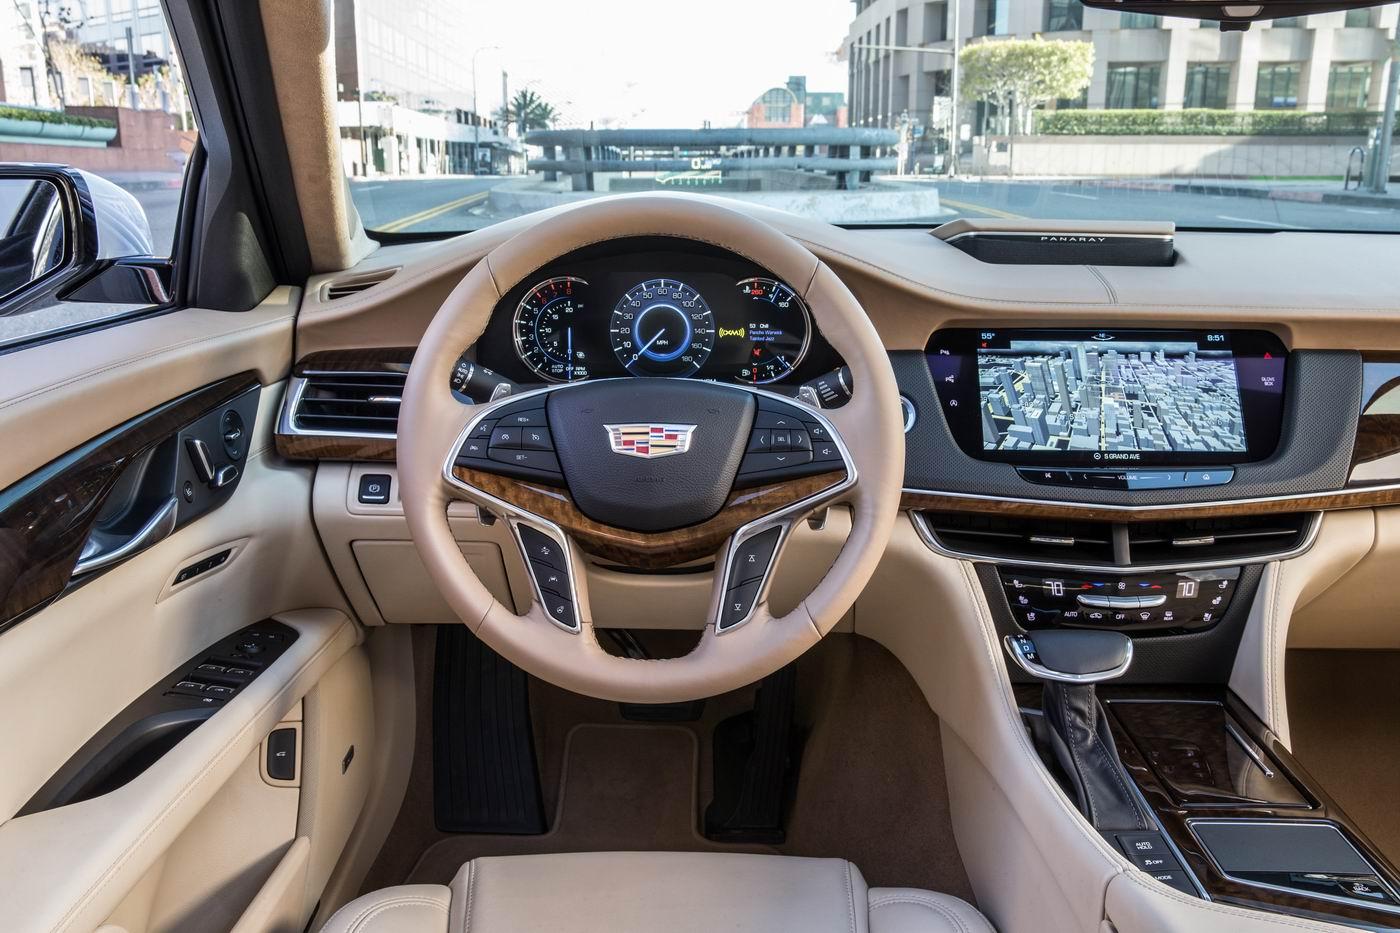 2017 Cadillac CT6 MotorShow Test Drive